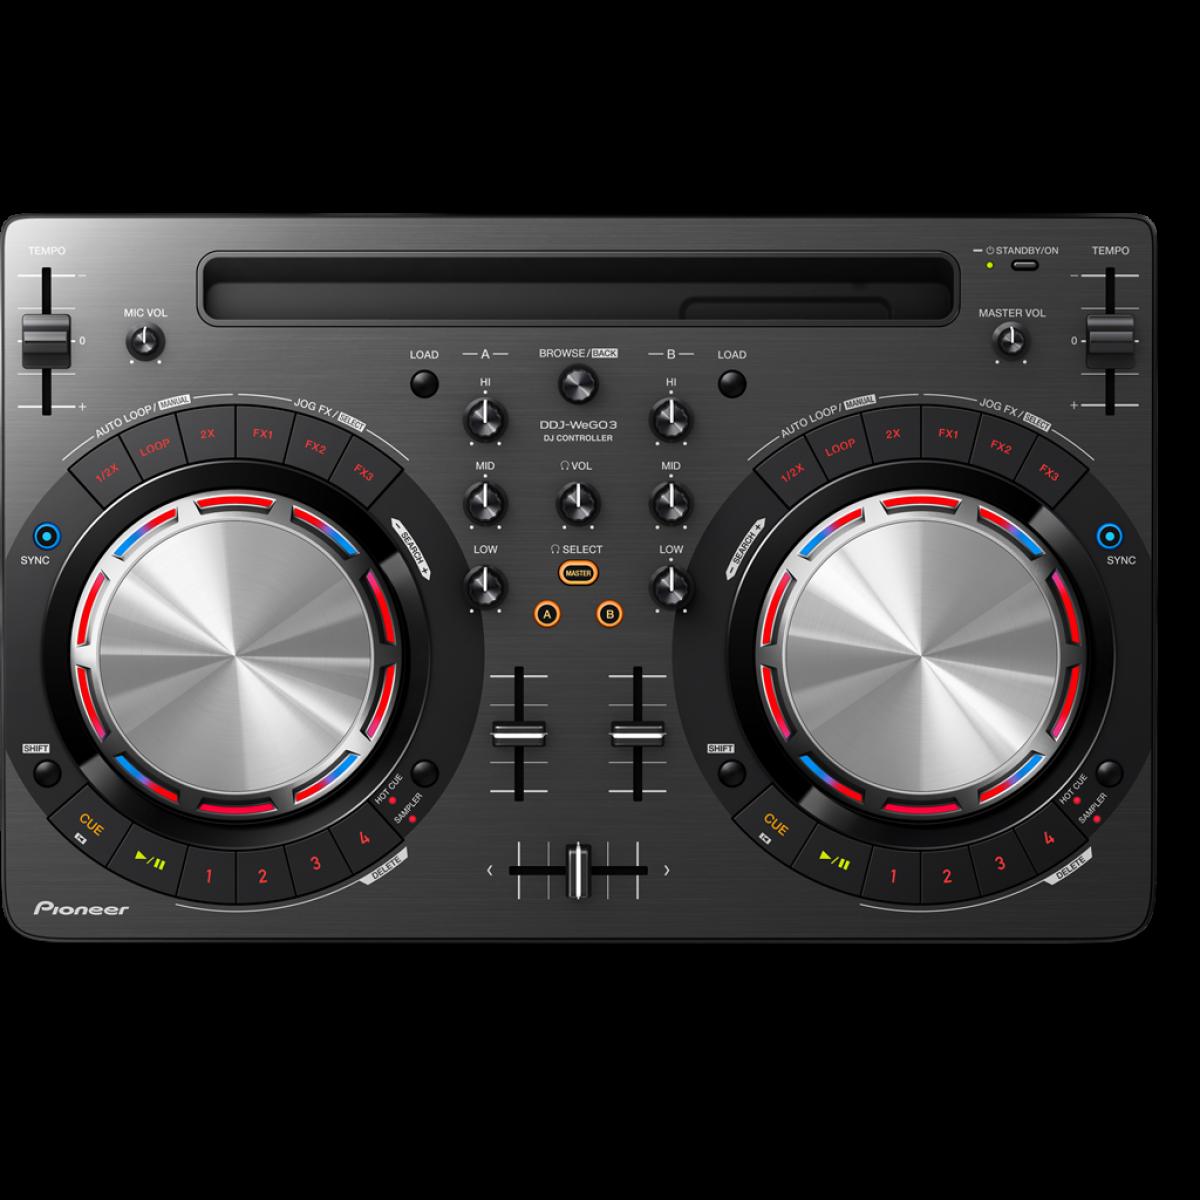 Pioneer DDJ Wego 3 Compact DJ Controller with iOS support Black